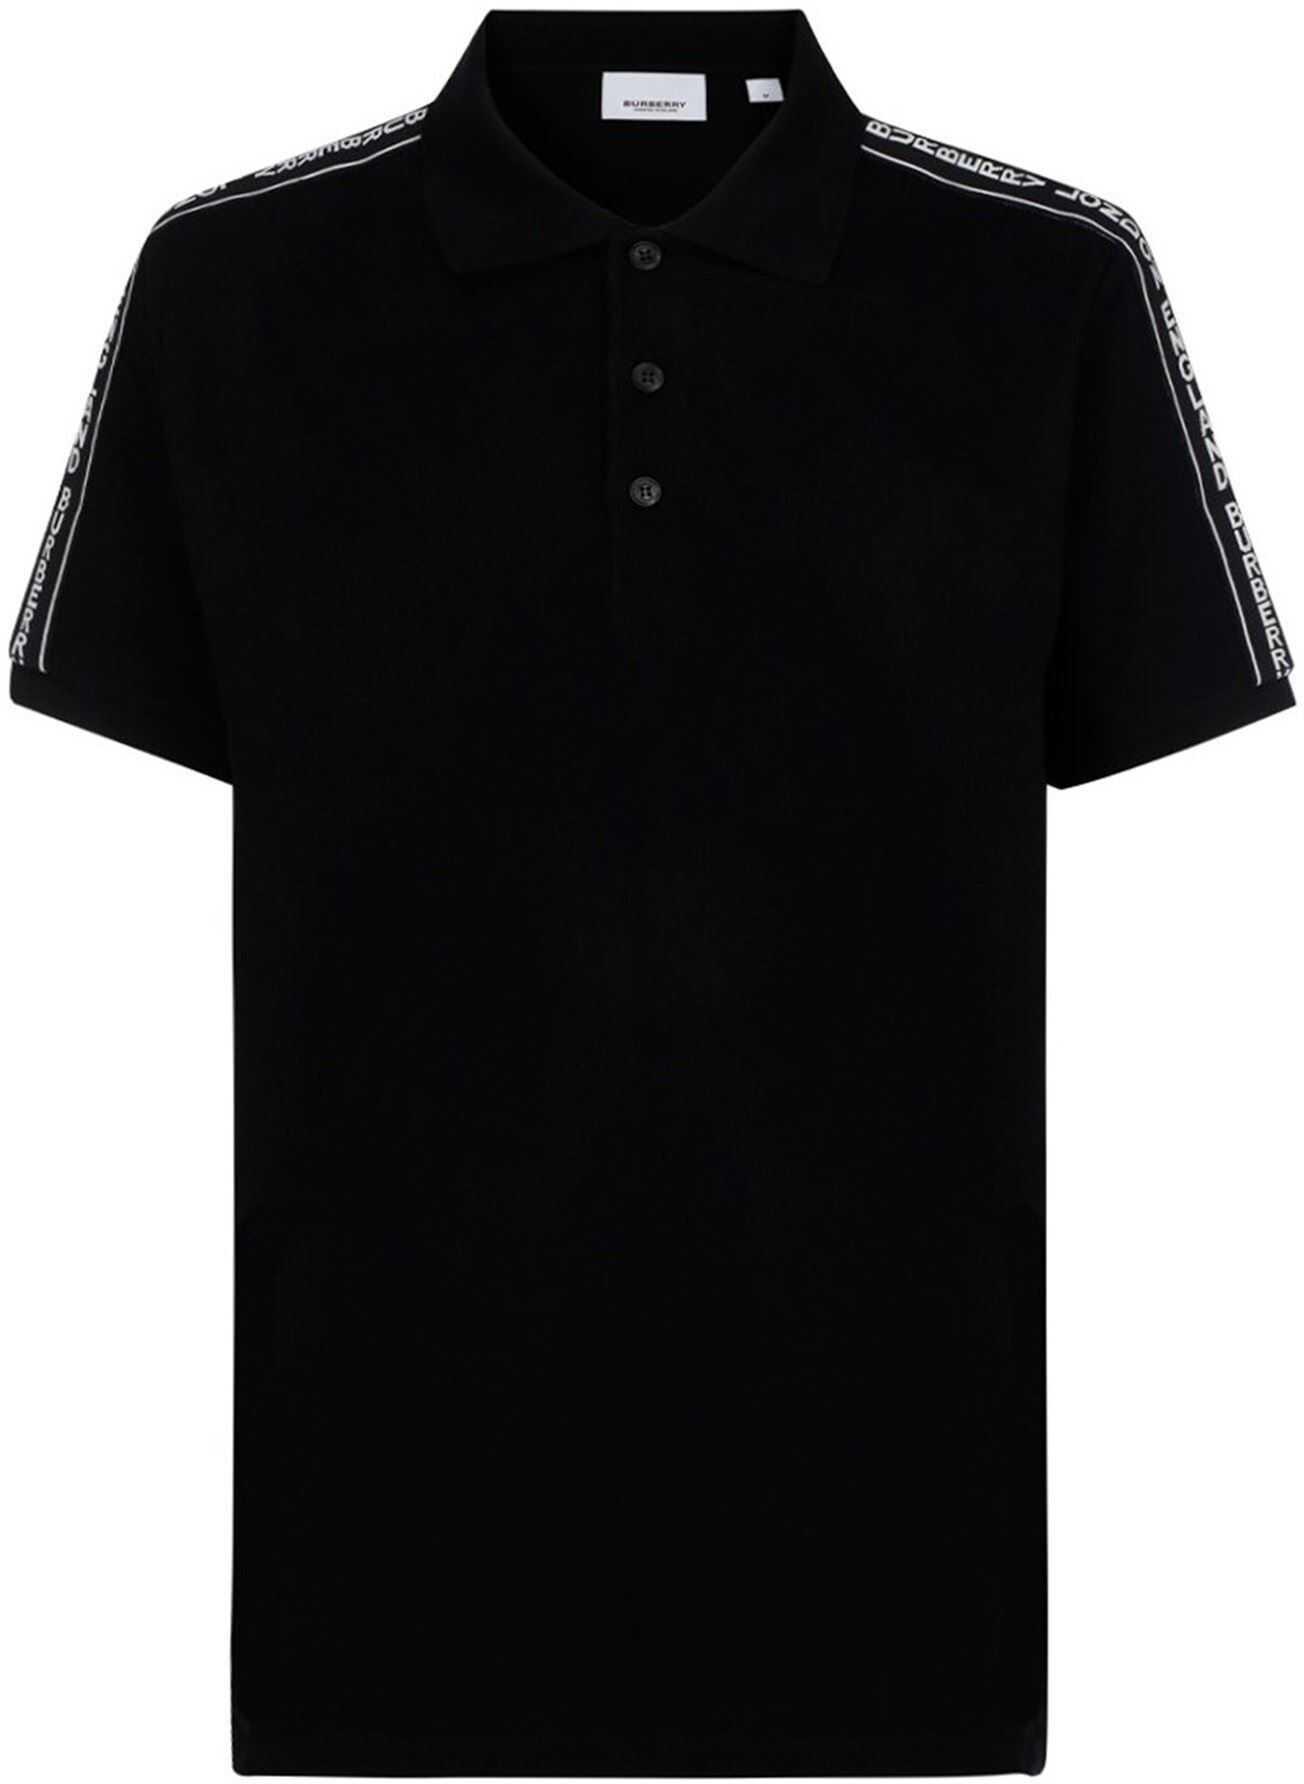 Burberry Tape Logo Polo Shirt In Black Black imagine